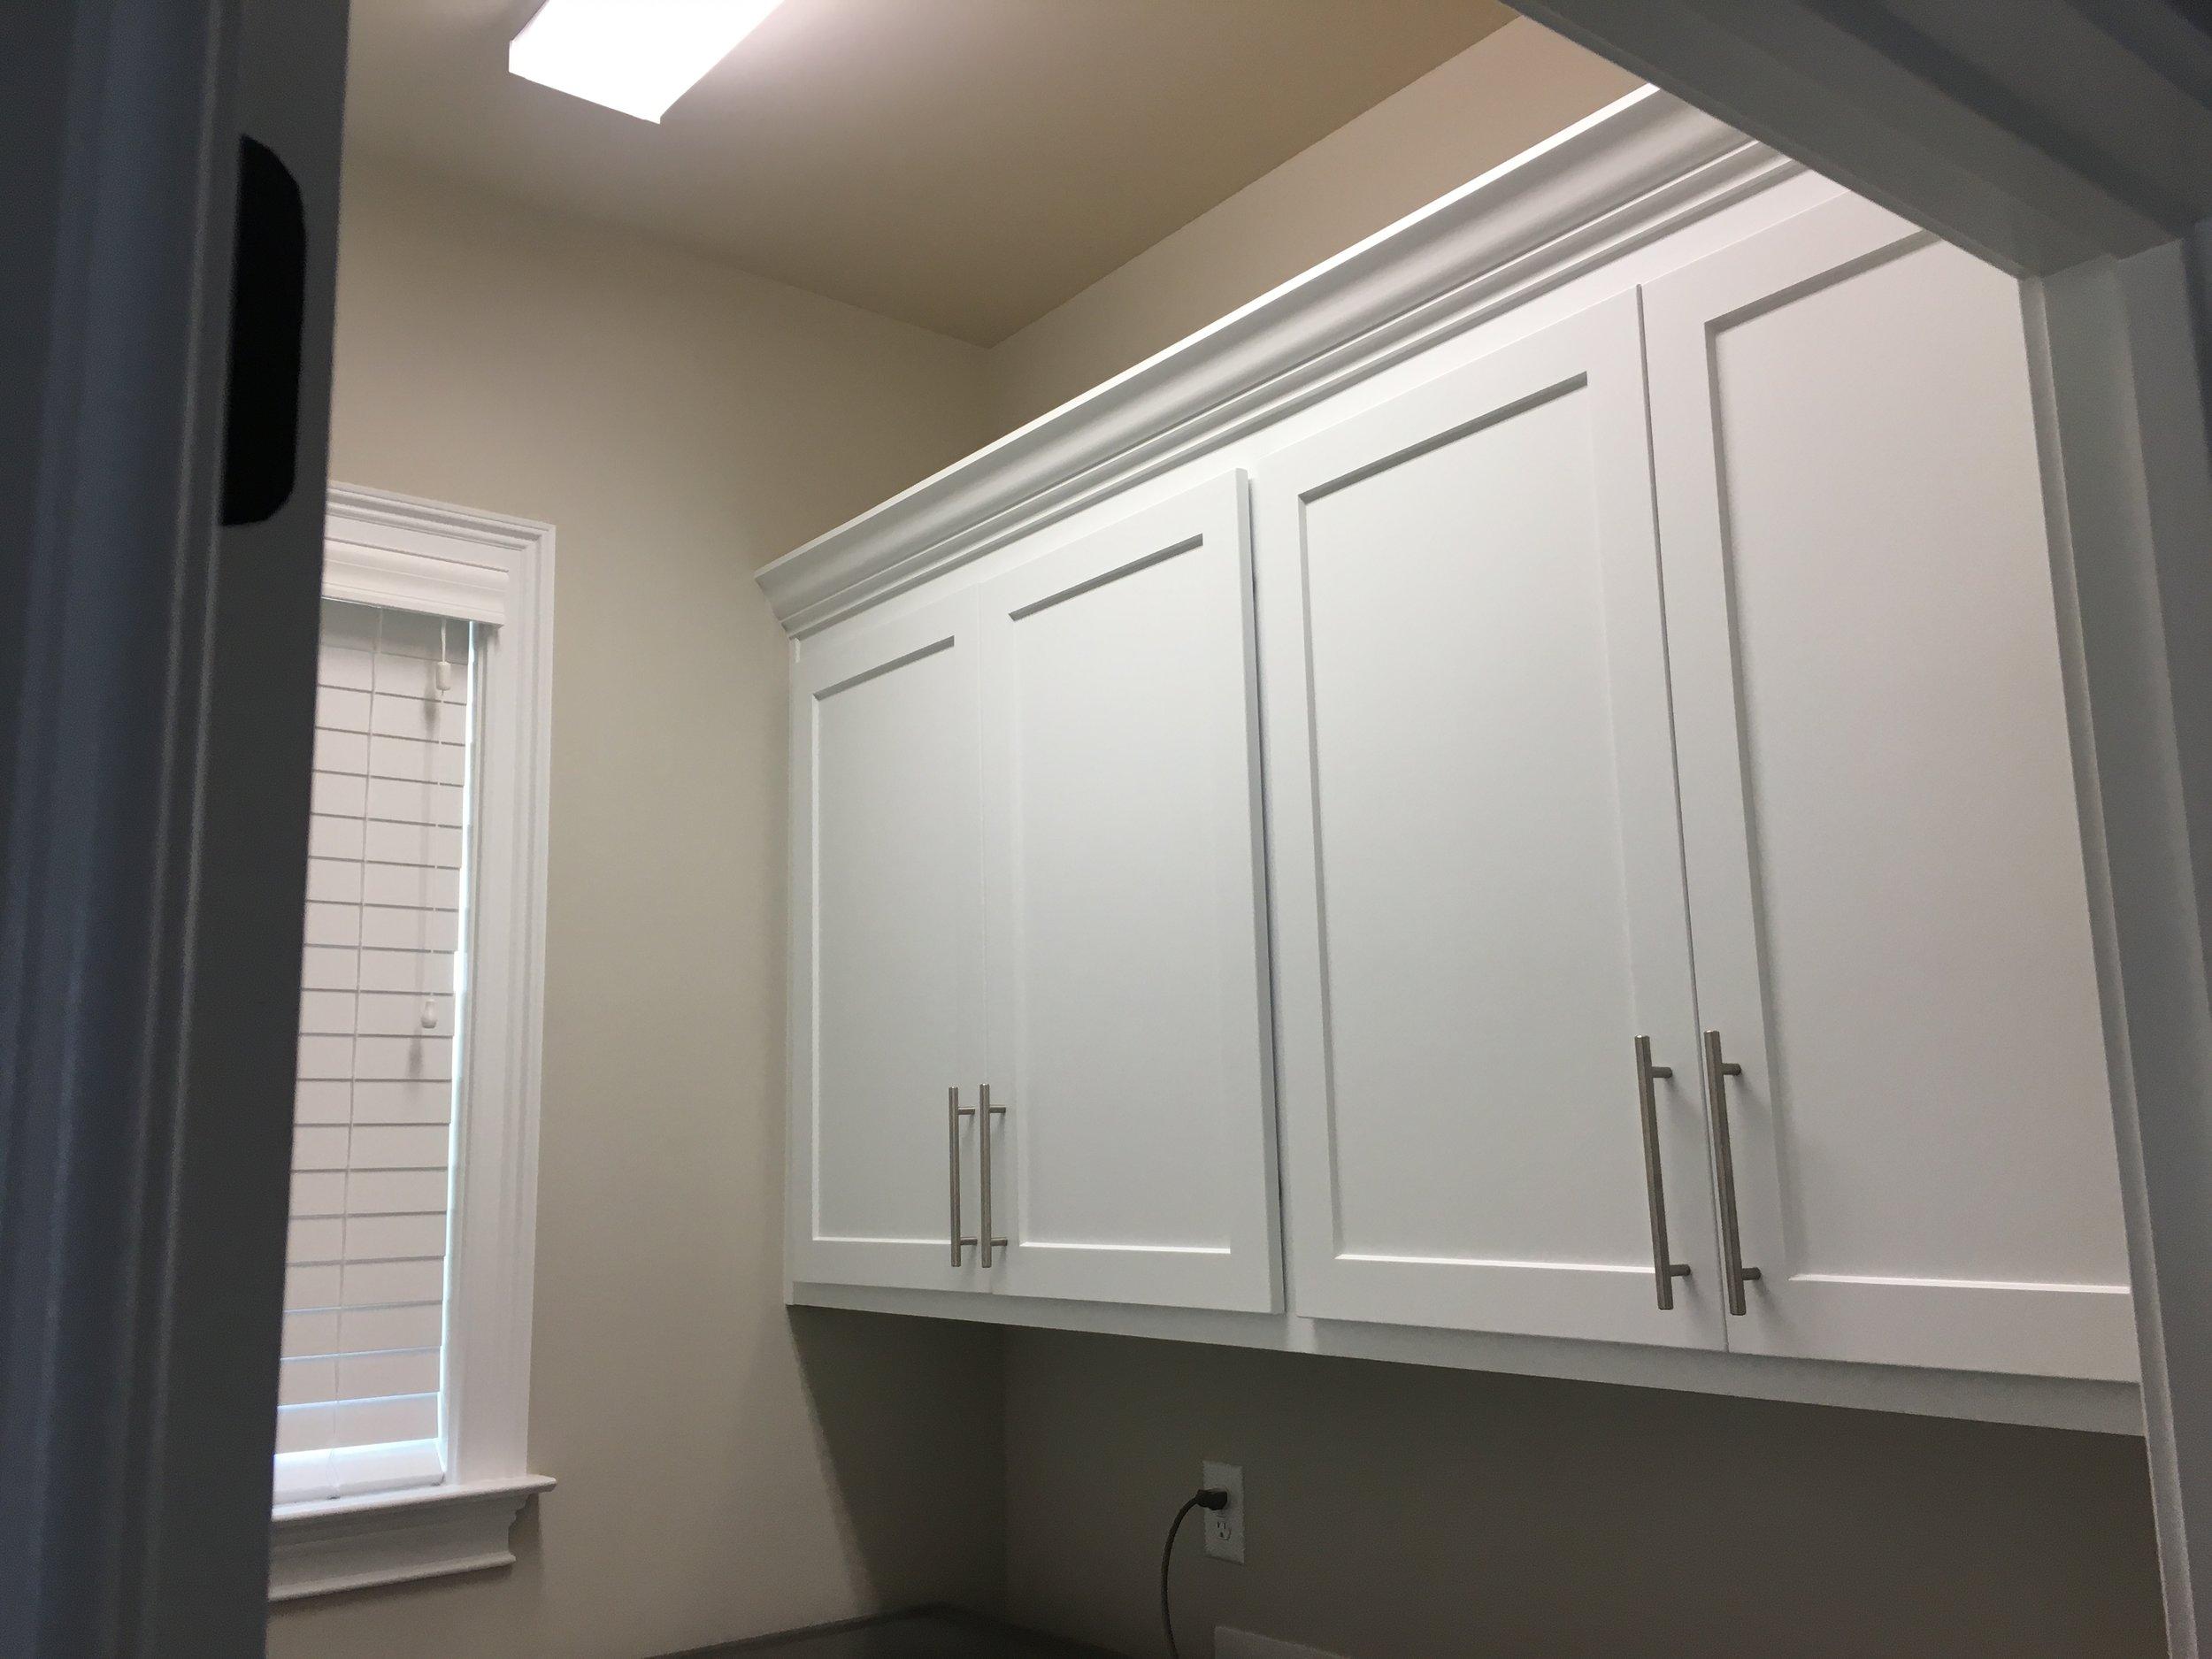 Dhanireddy Laundry Cabinets.JPG